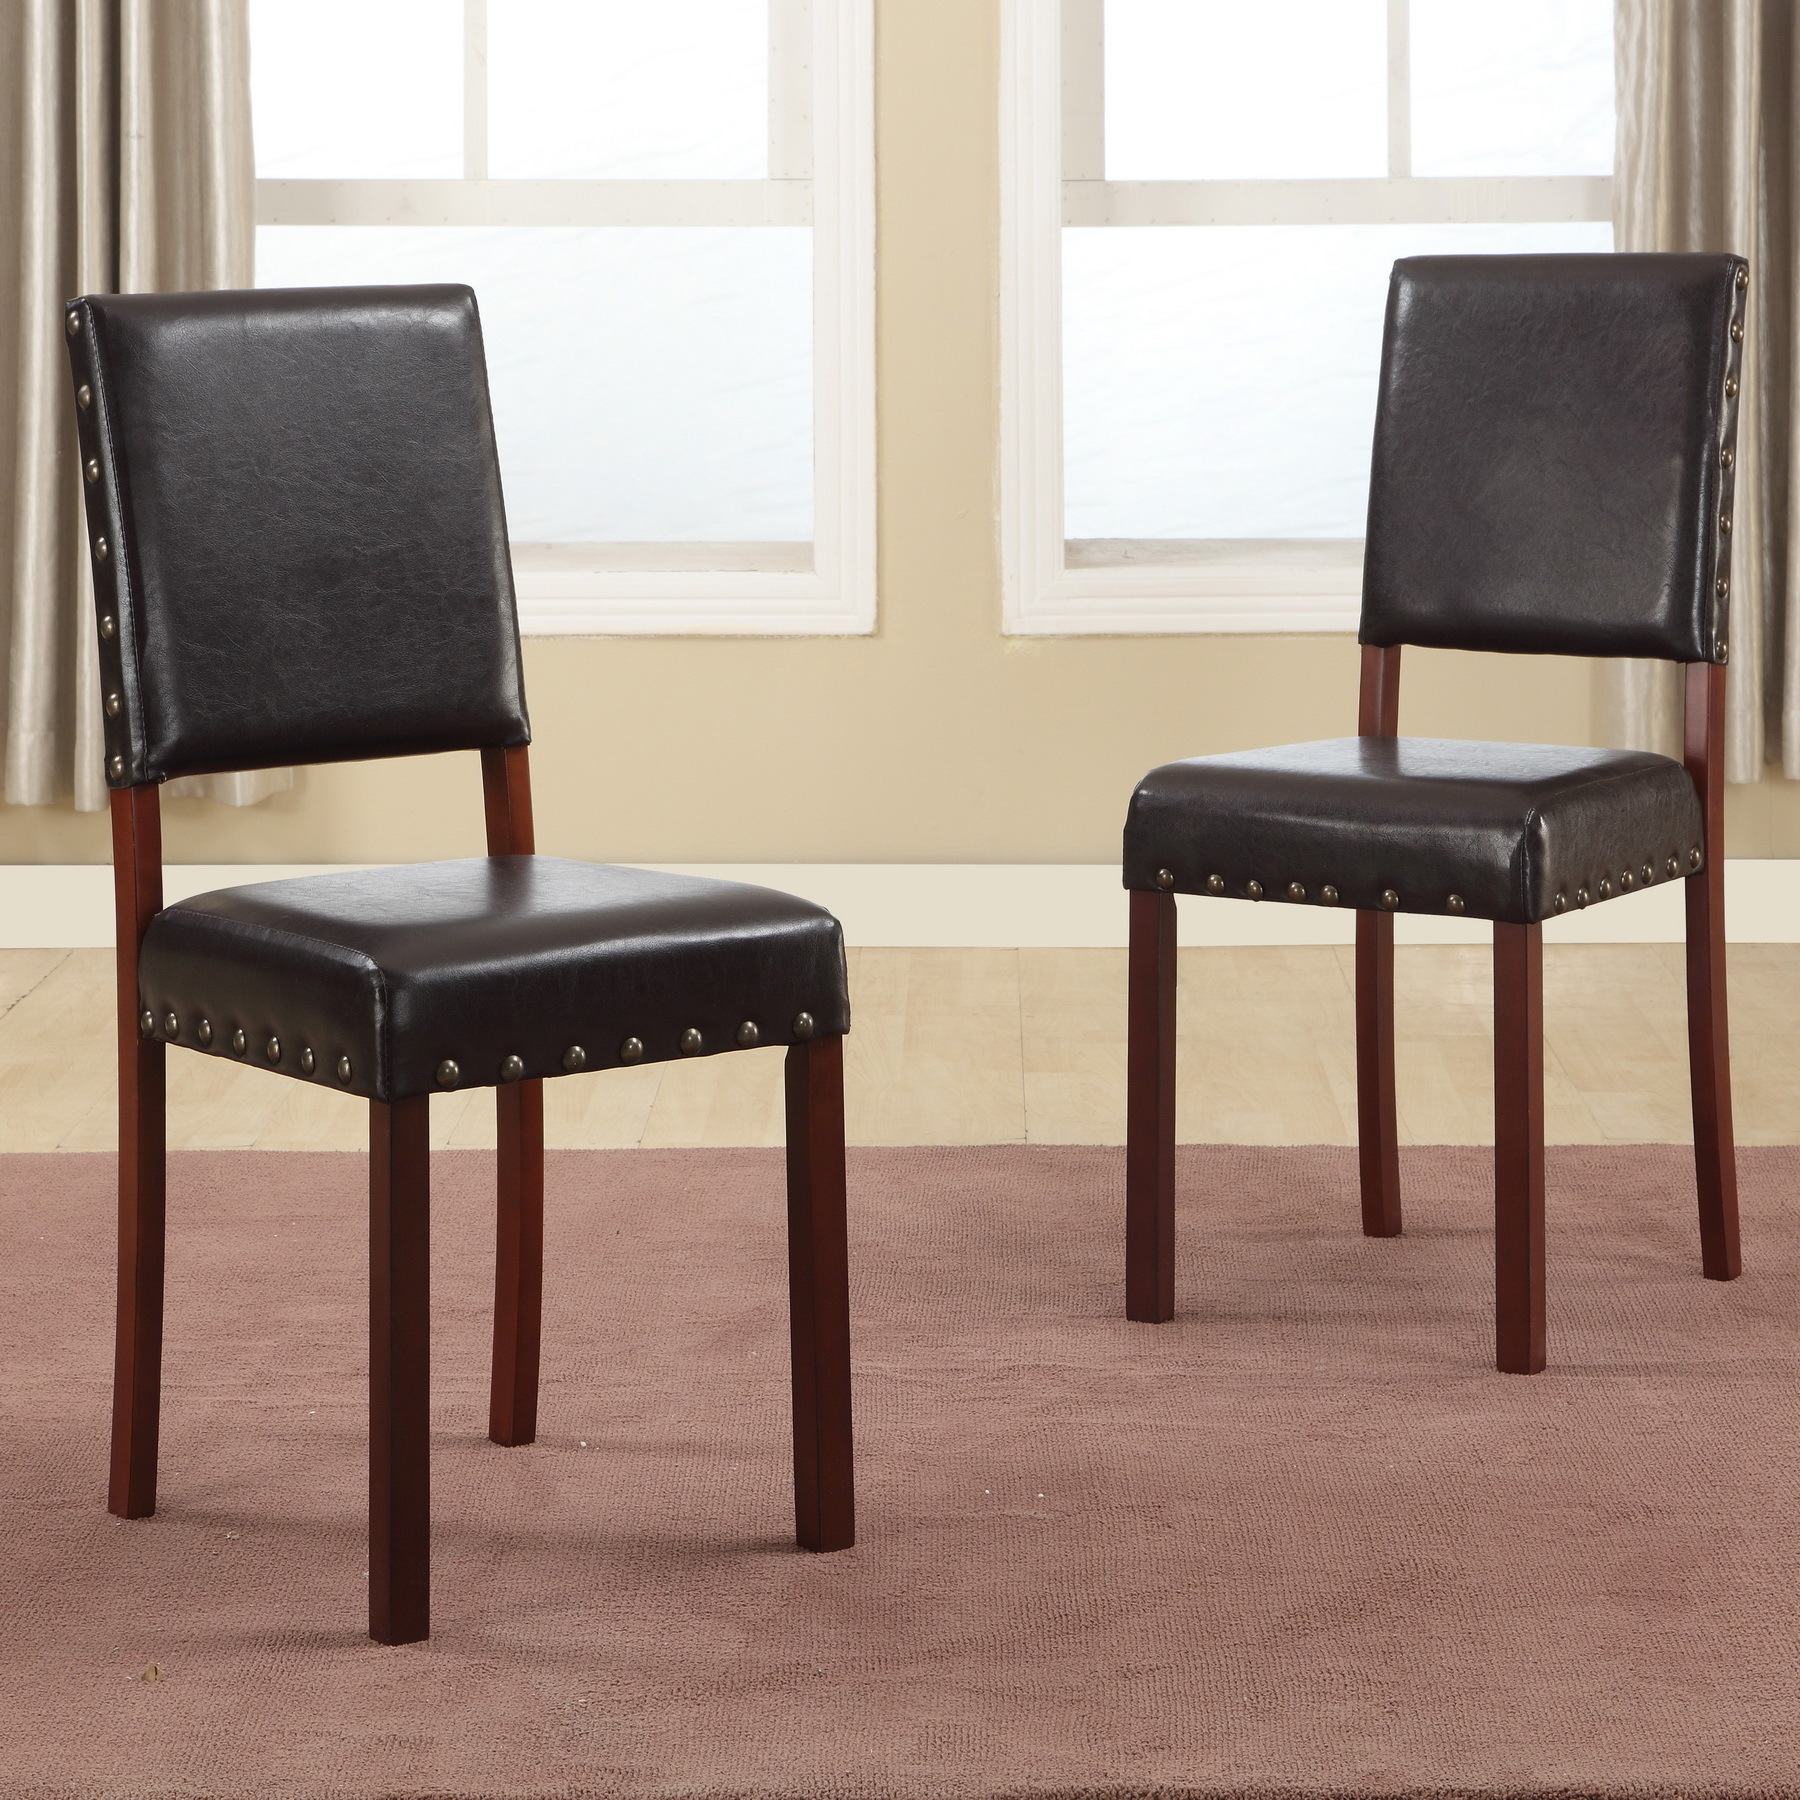 Kmart kitchen chairs Photo - 10